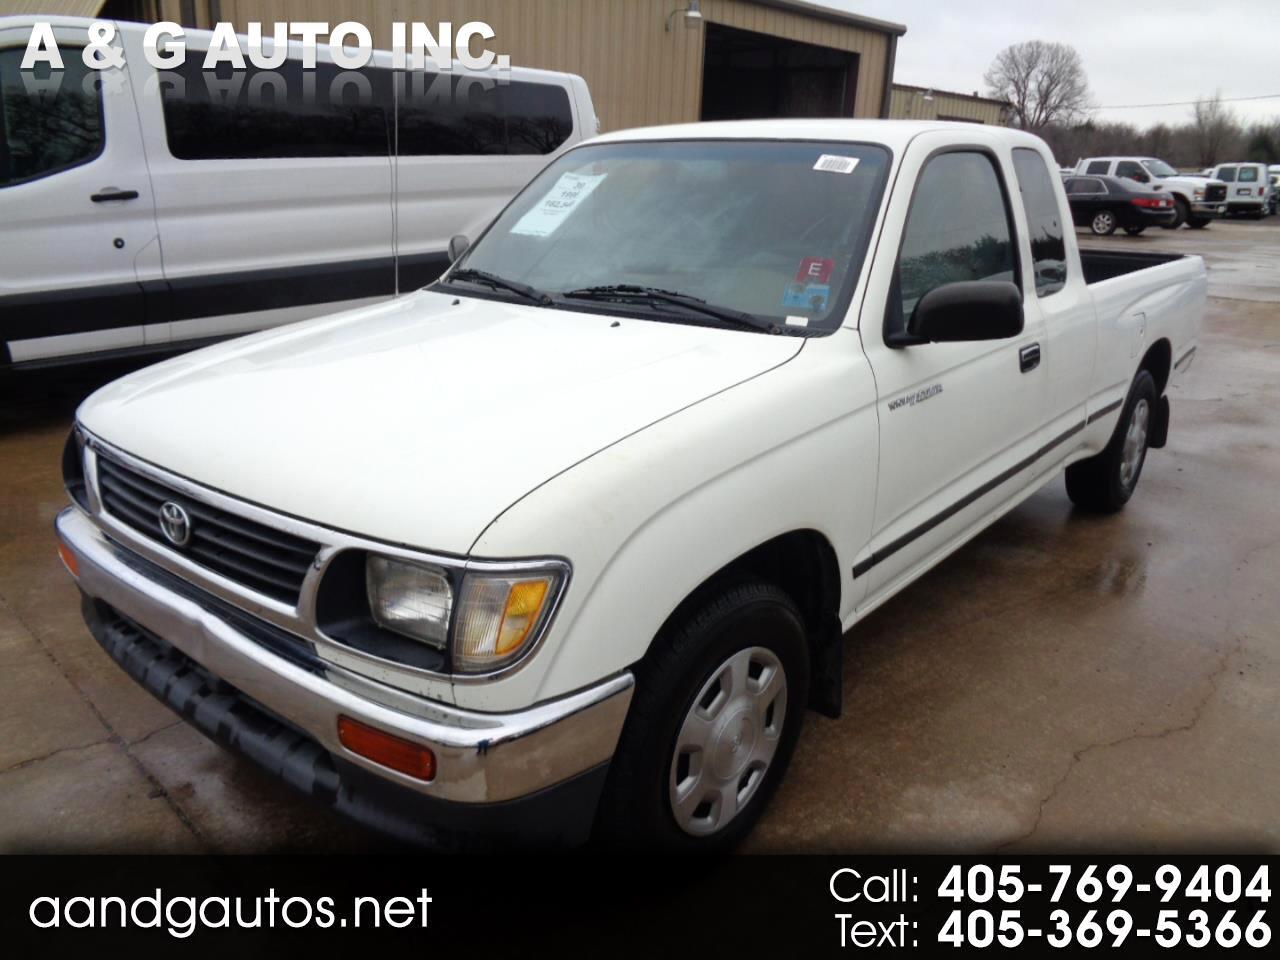 1996 Toyota Tacoma Xtracab 2WD